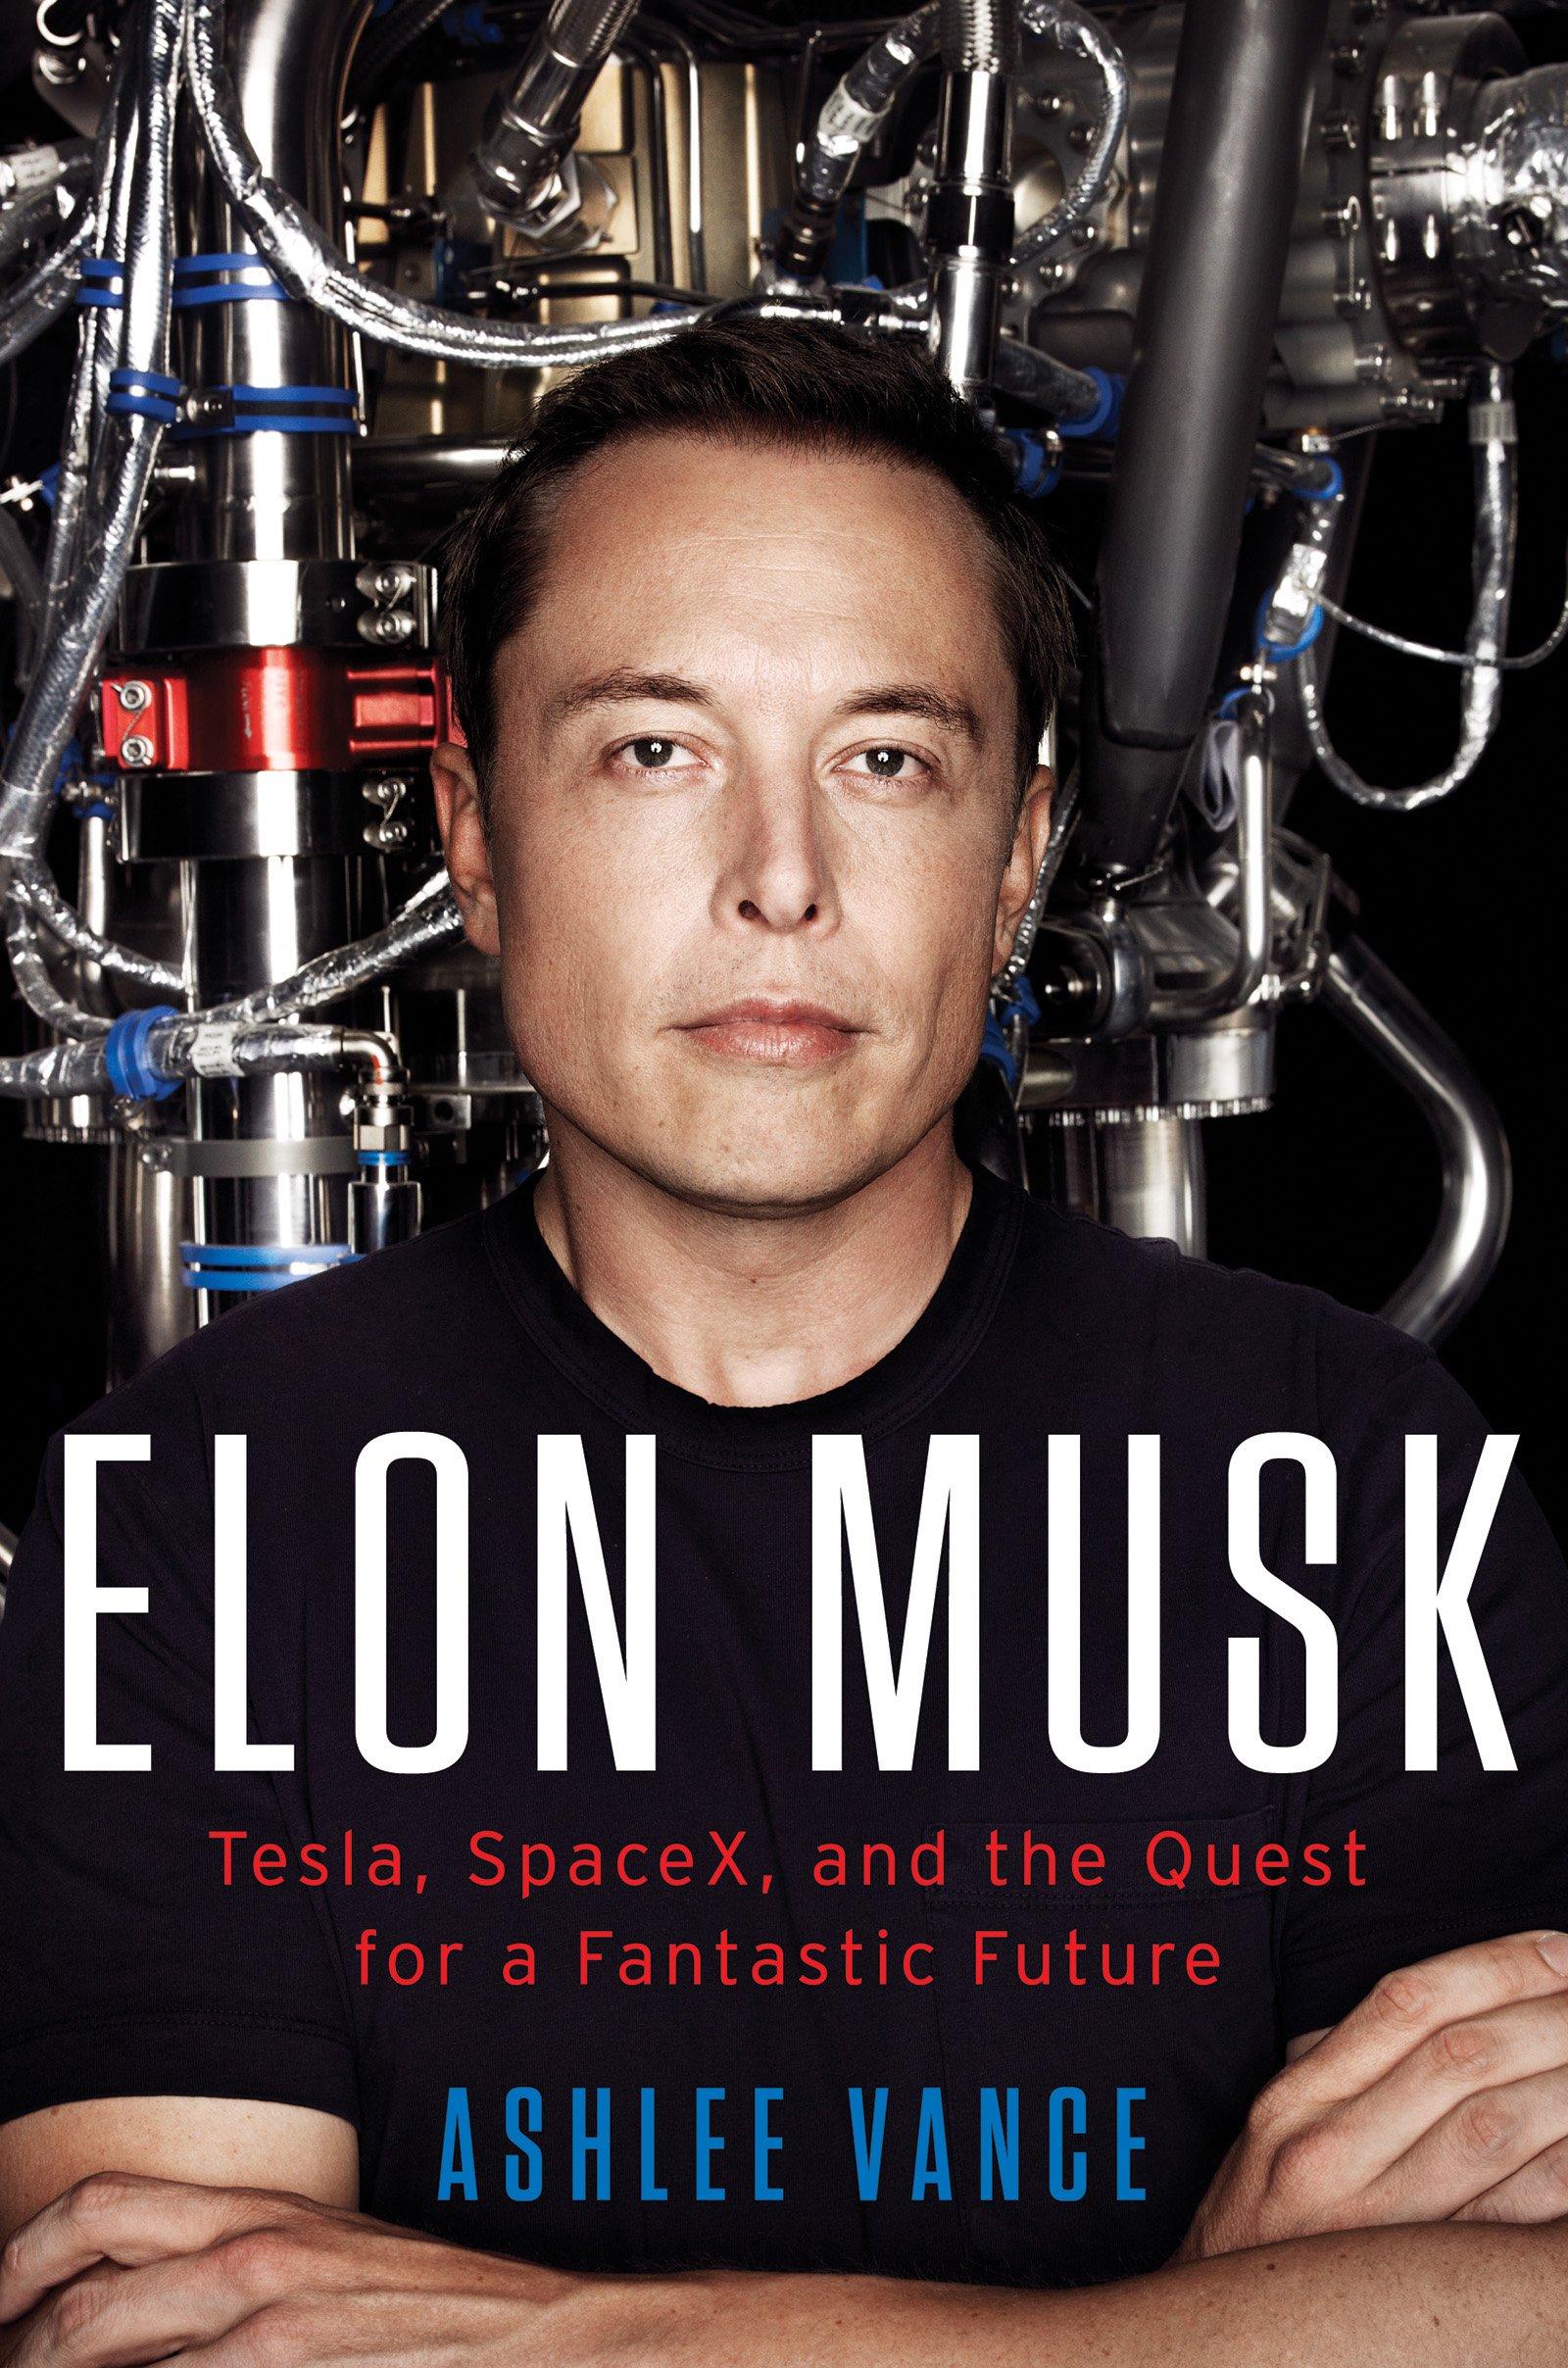 Elon-Musk-Book-Cover.jpg